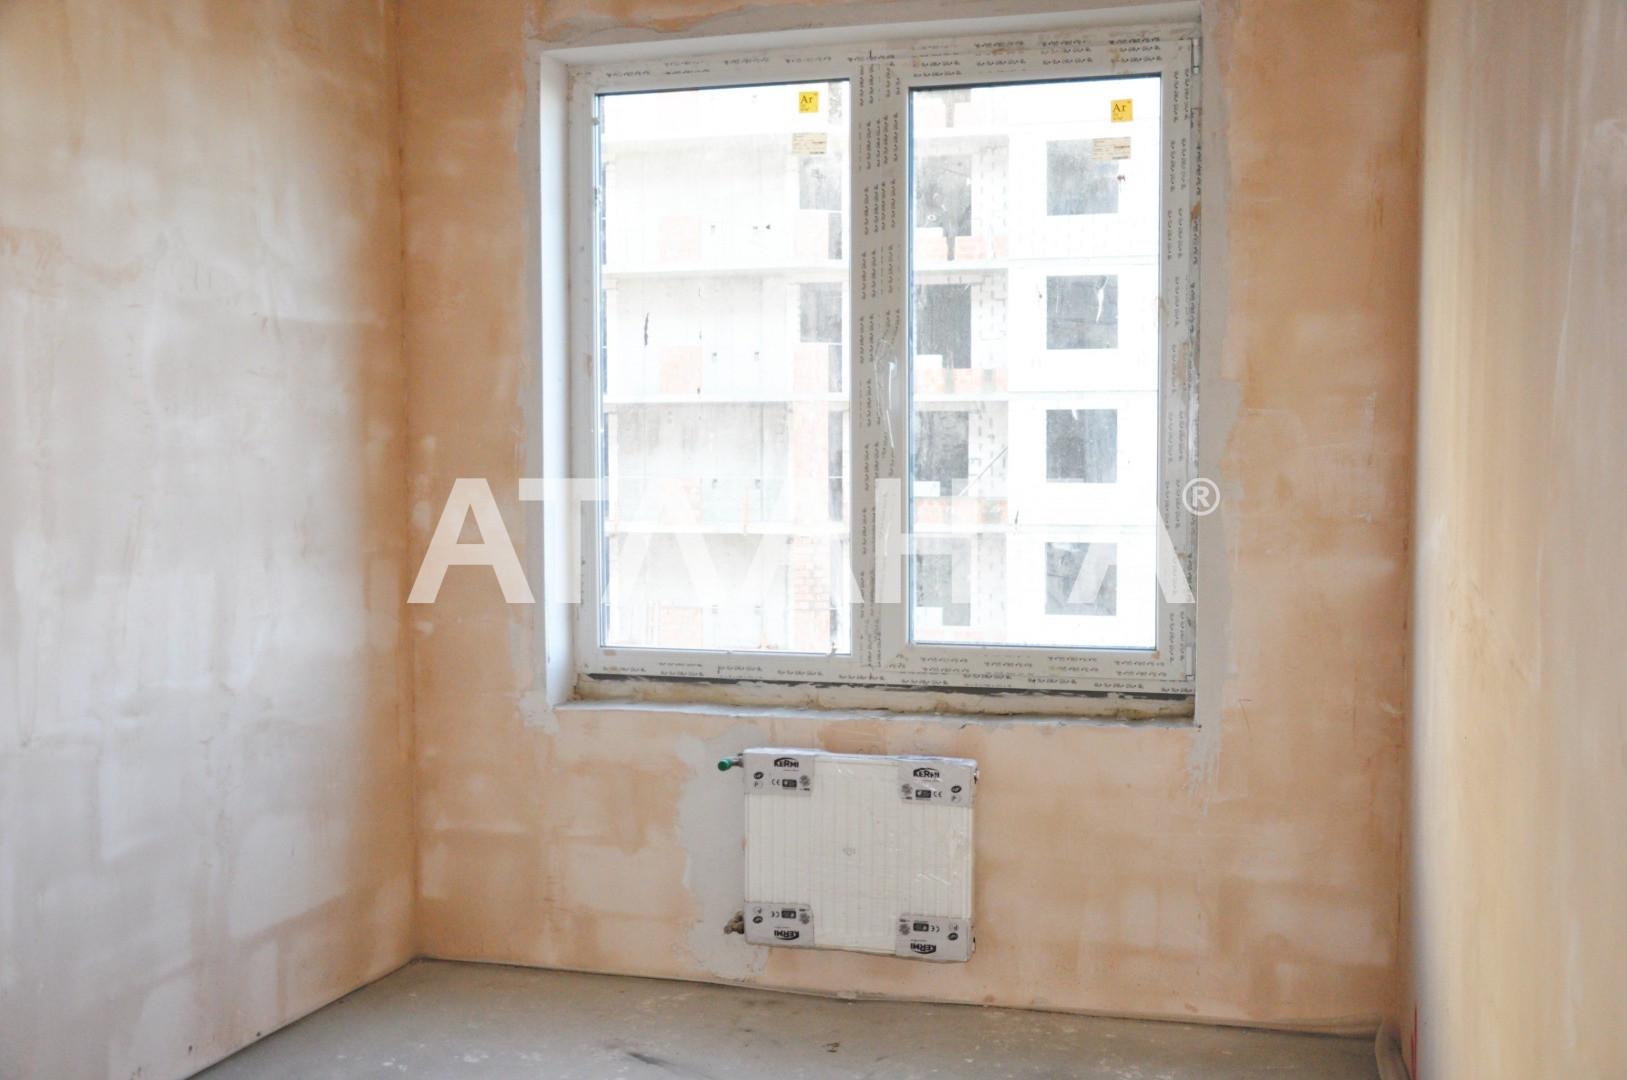 Продается 2-комнатная Квартира на ул. Генуэзская — 68 100 у.е. (фото №3)